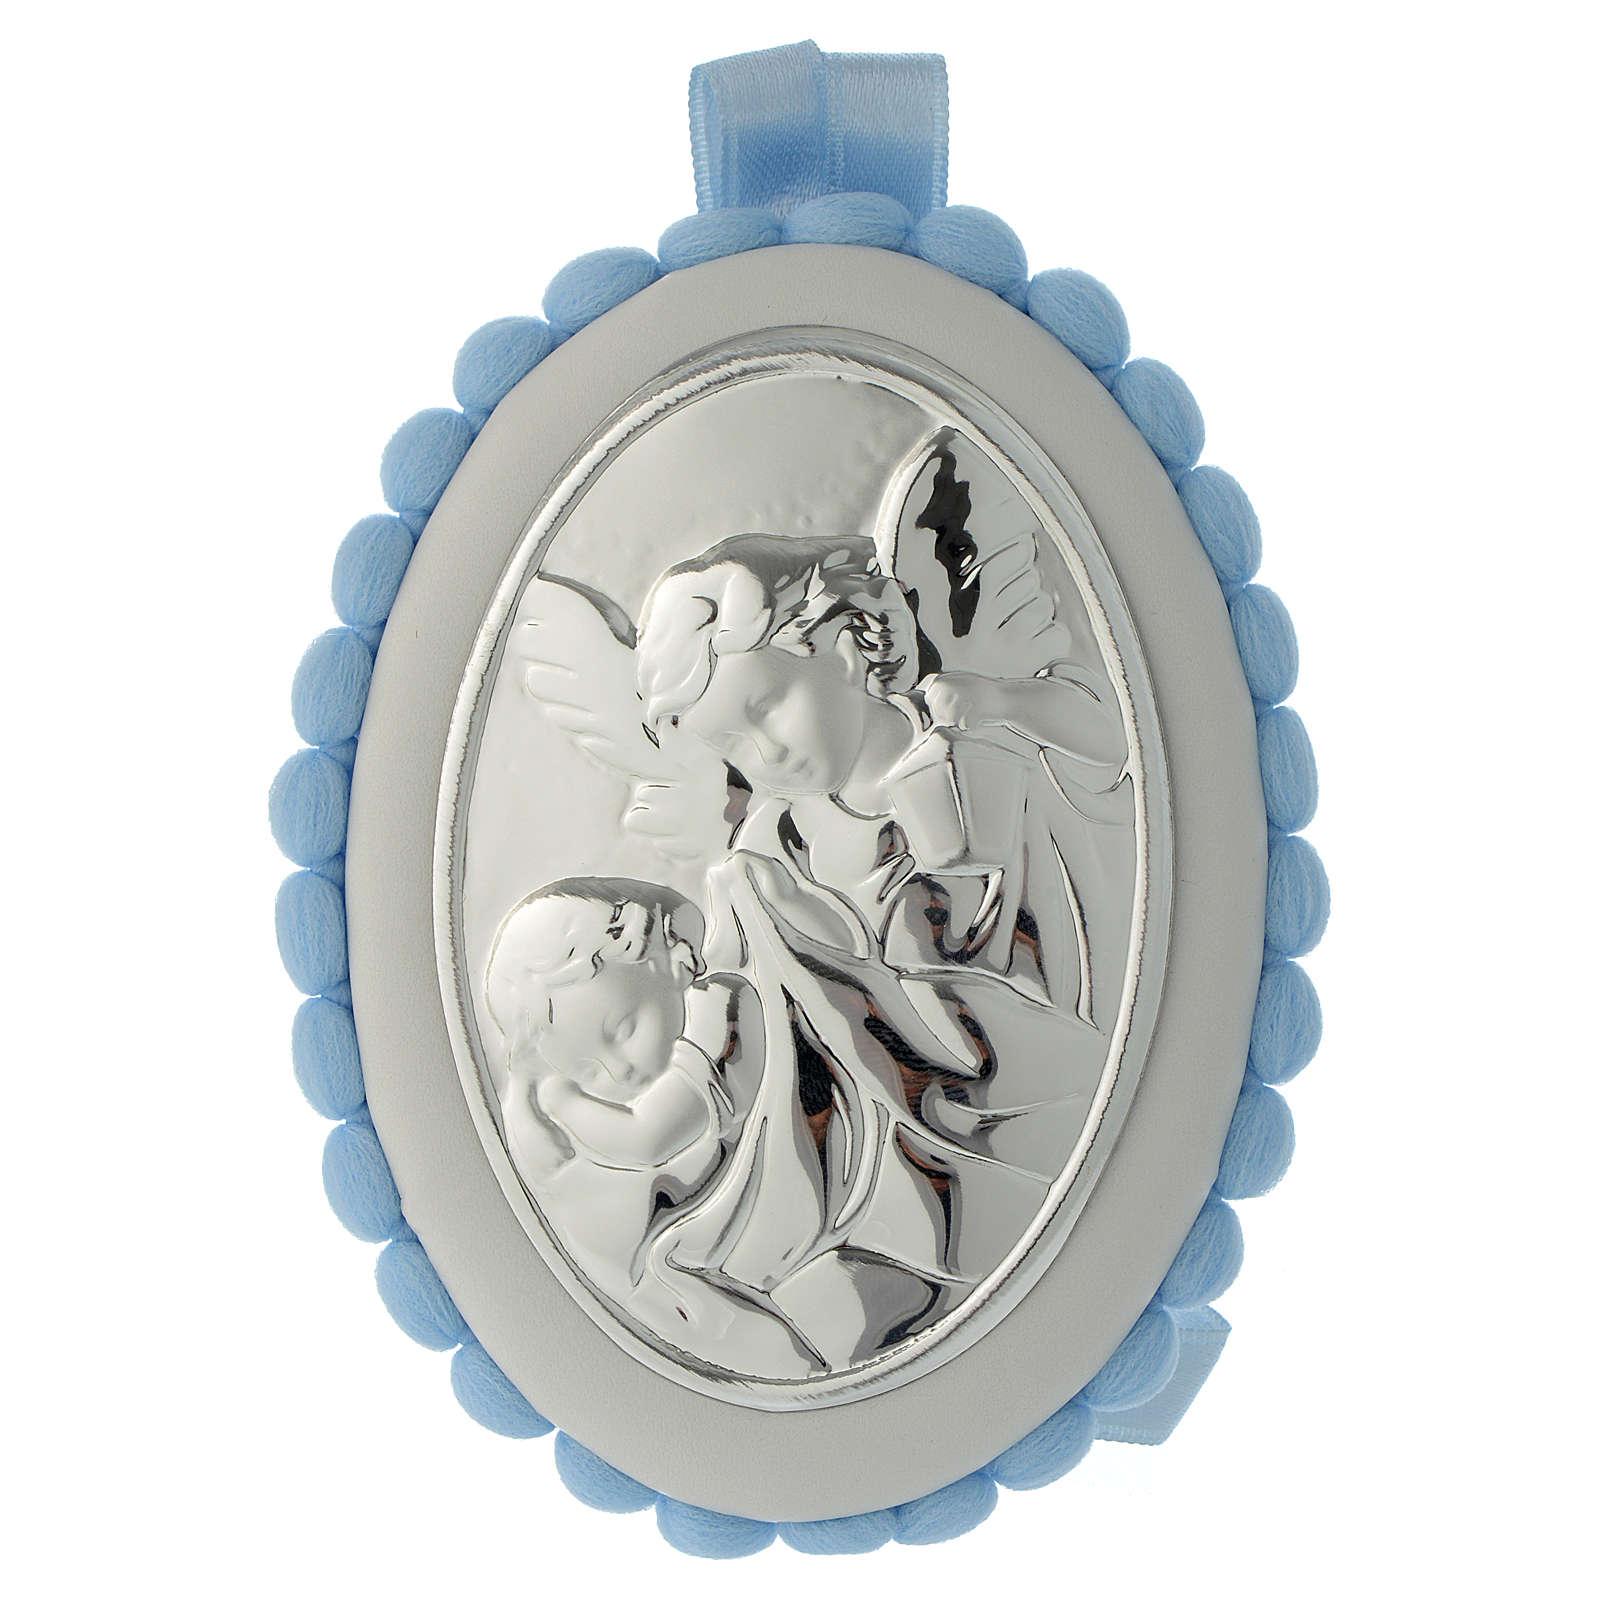 Cradle decoration light blue with pom pom, angel and music box 4